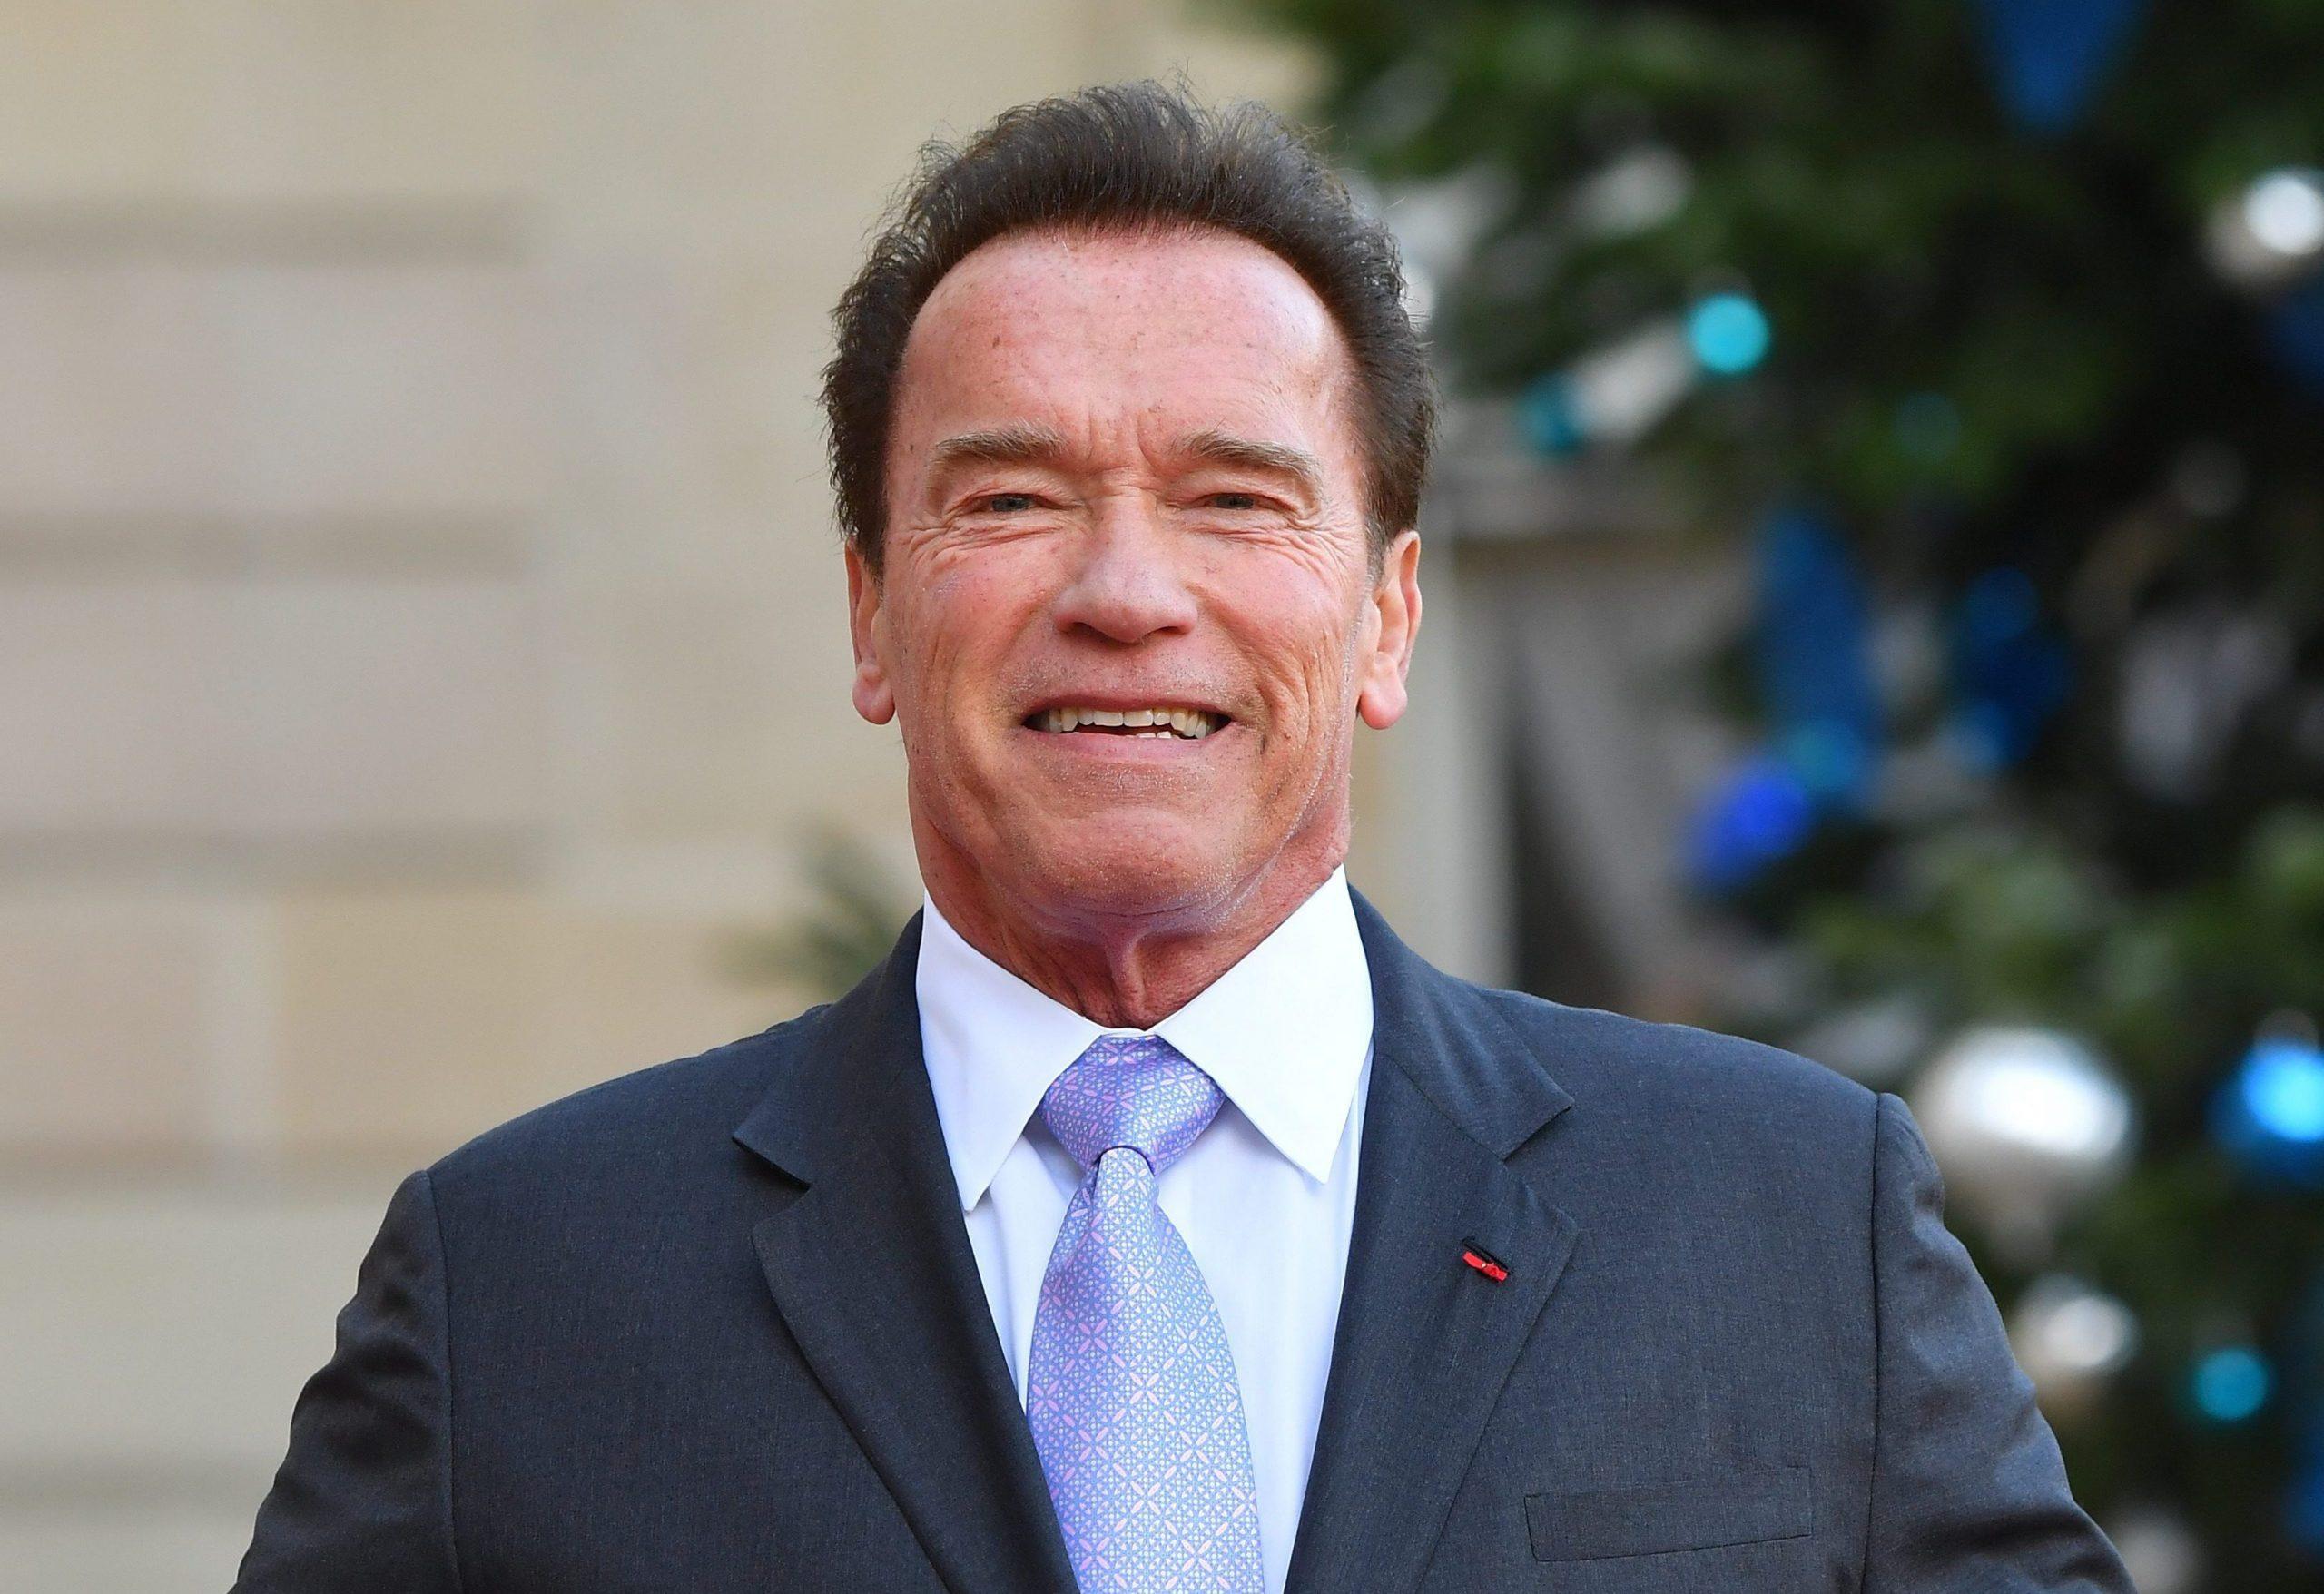 Did Arnold Schwarzenegger Have An Affair?